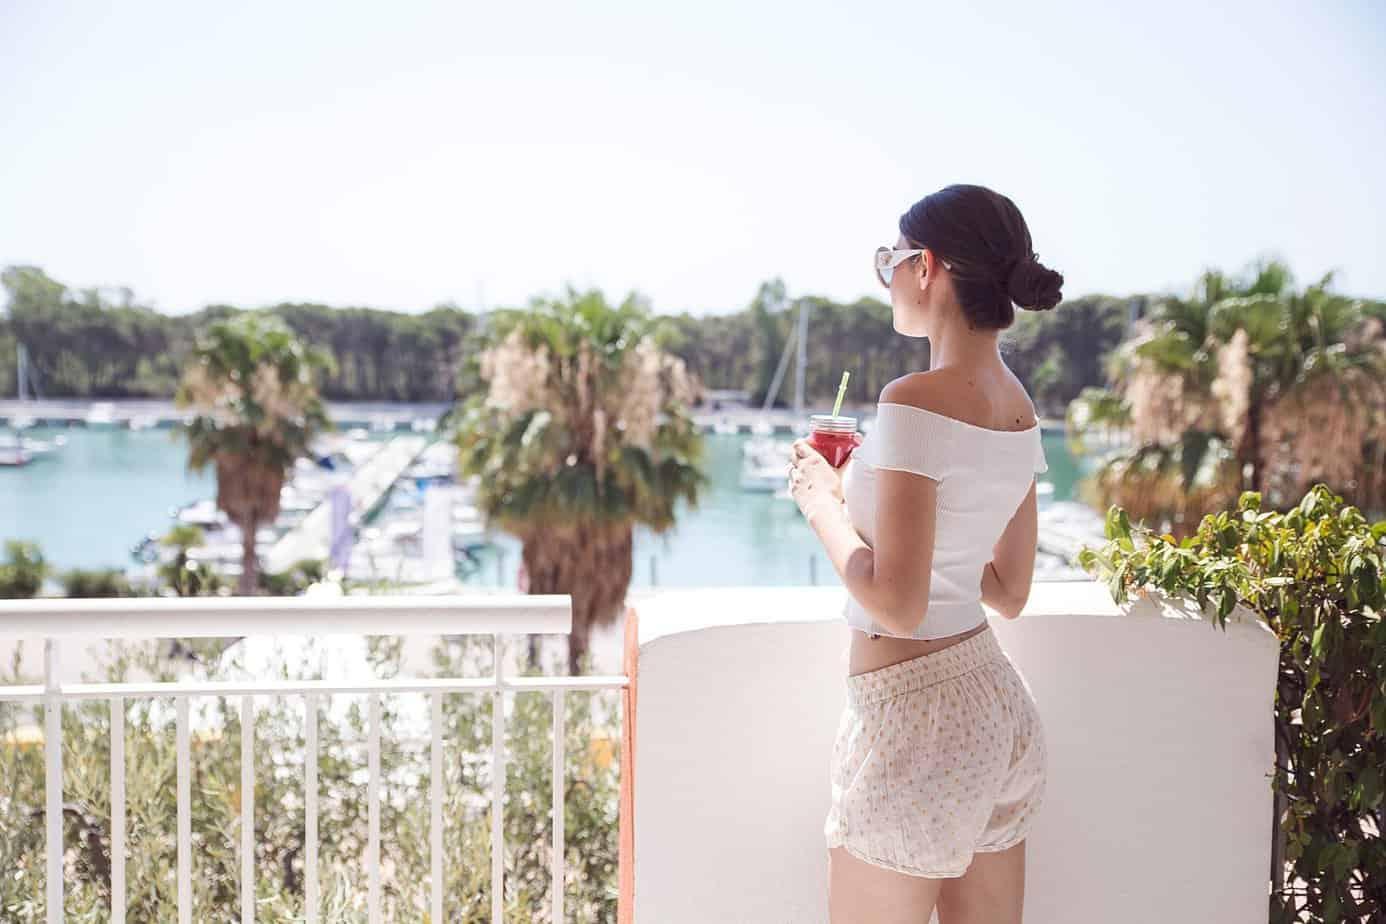 FloraDalleVacche_Florasrunway_FrancescaBandiera_Matera_PortoDegliArgonauti_1